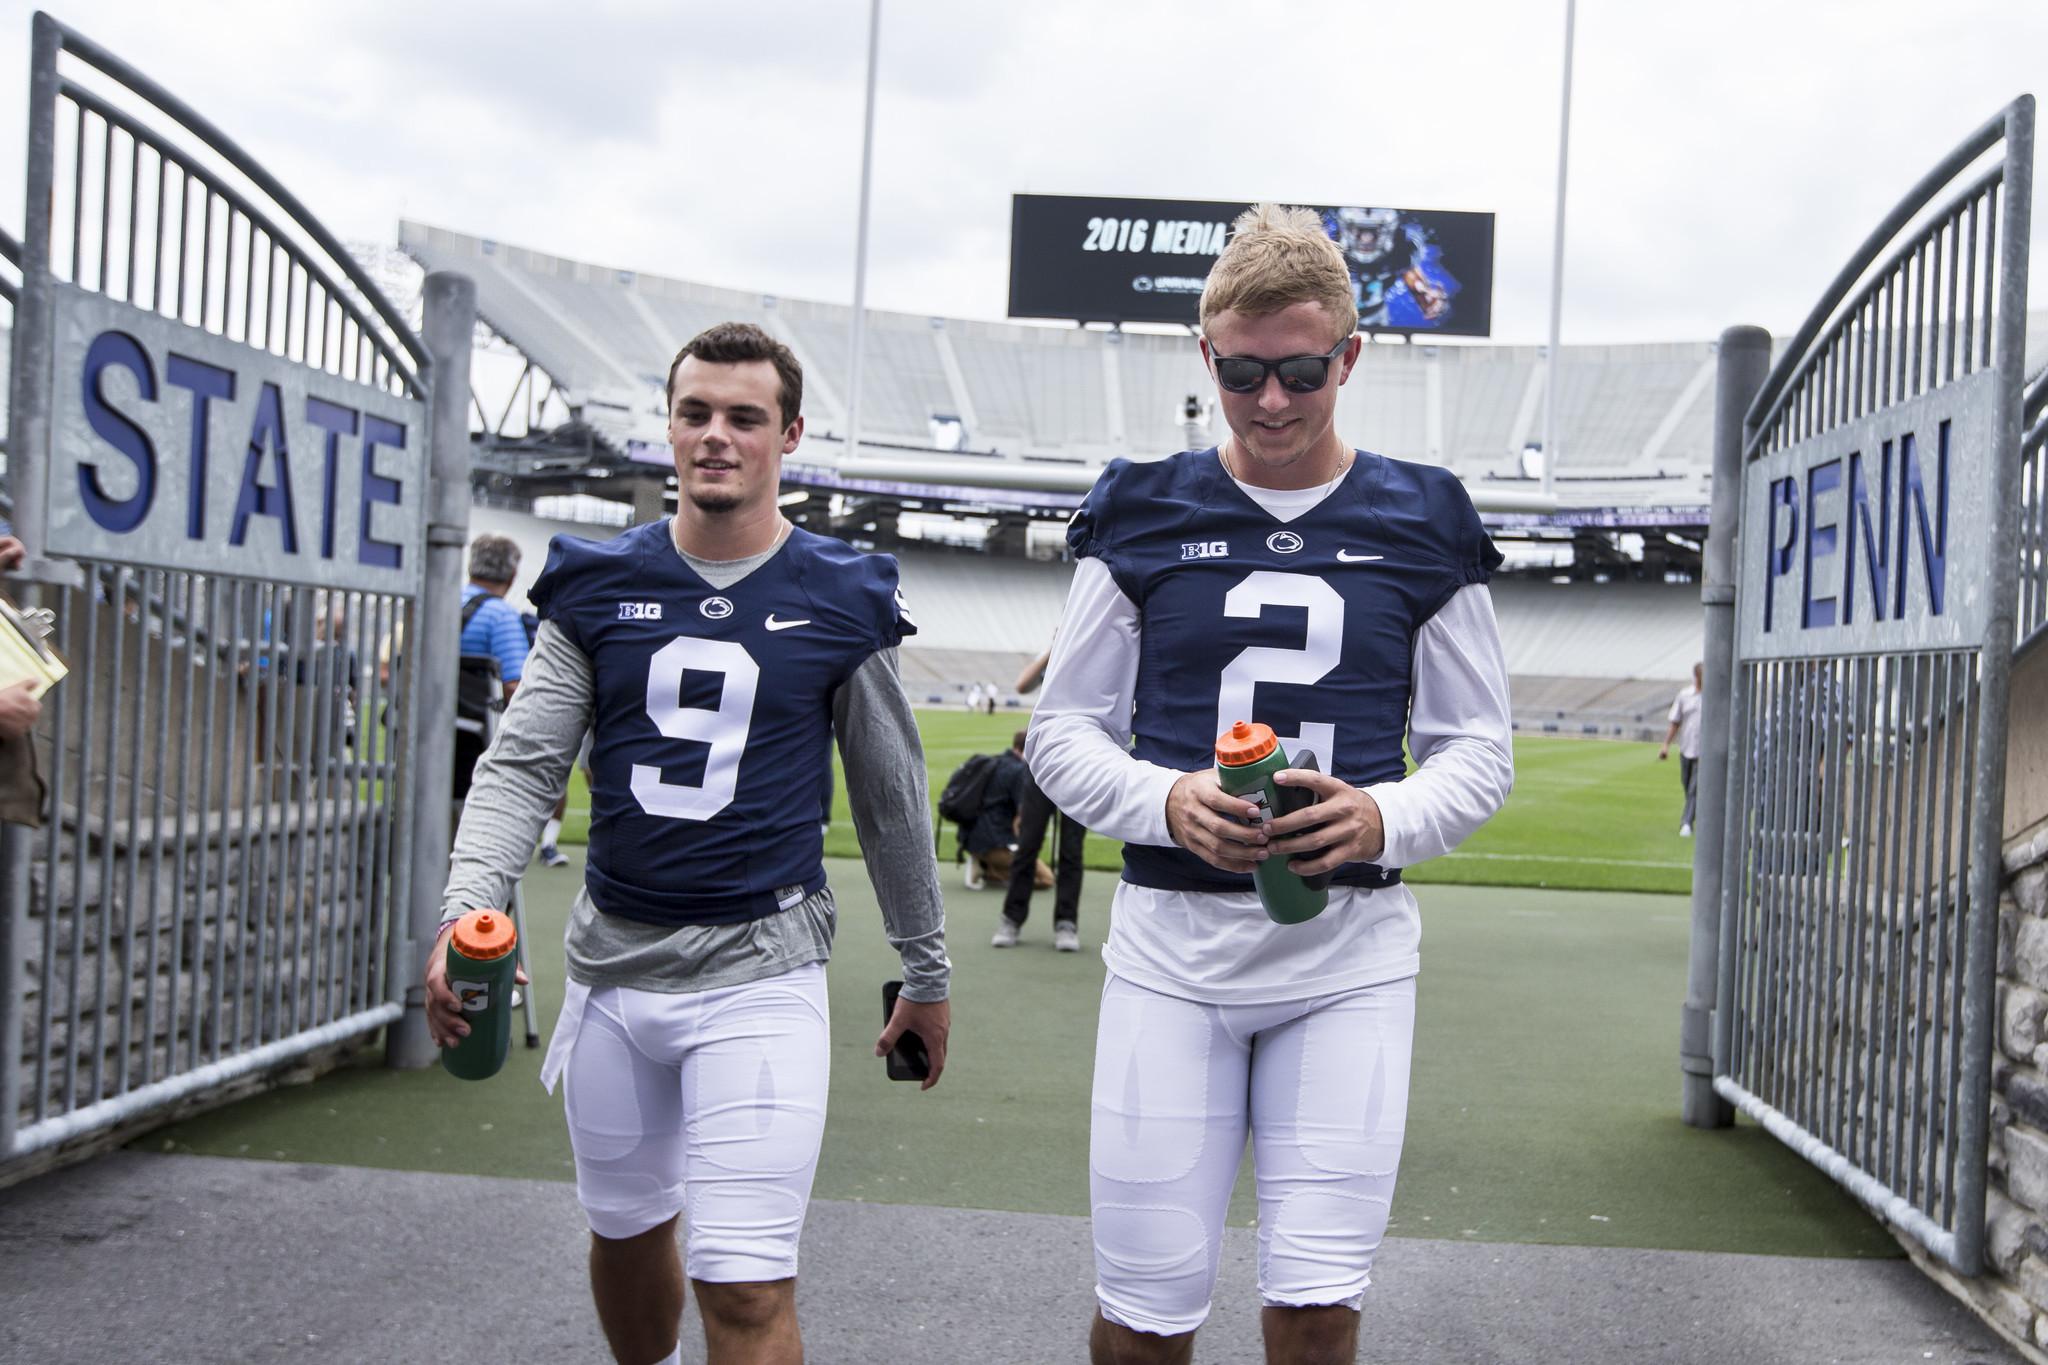 Mc-what-s-next-for-penn-state-quarterback-tommy-stevens-20170327